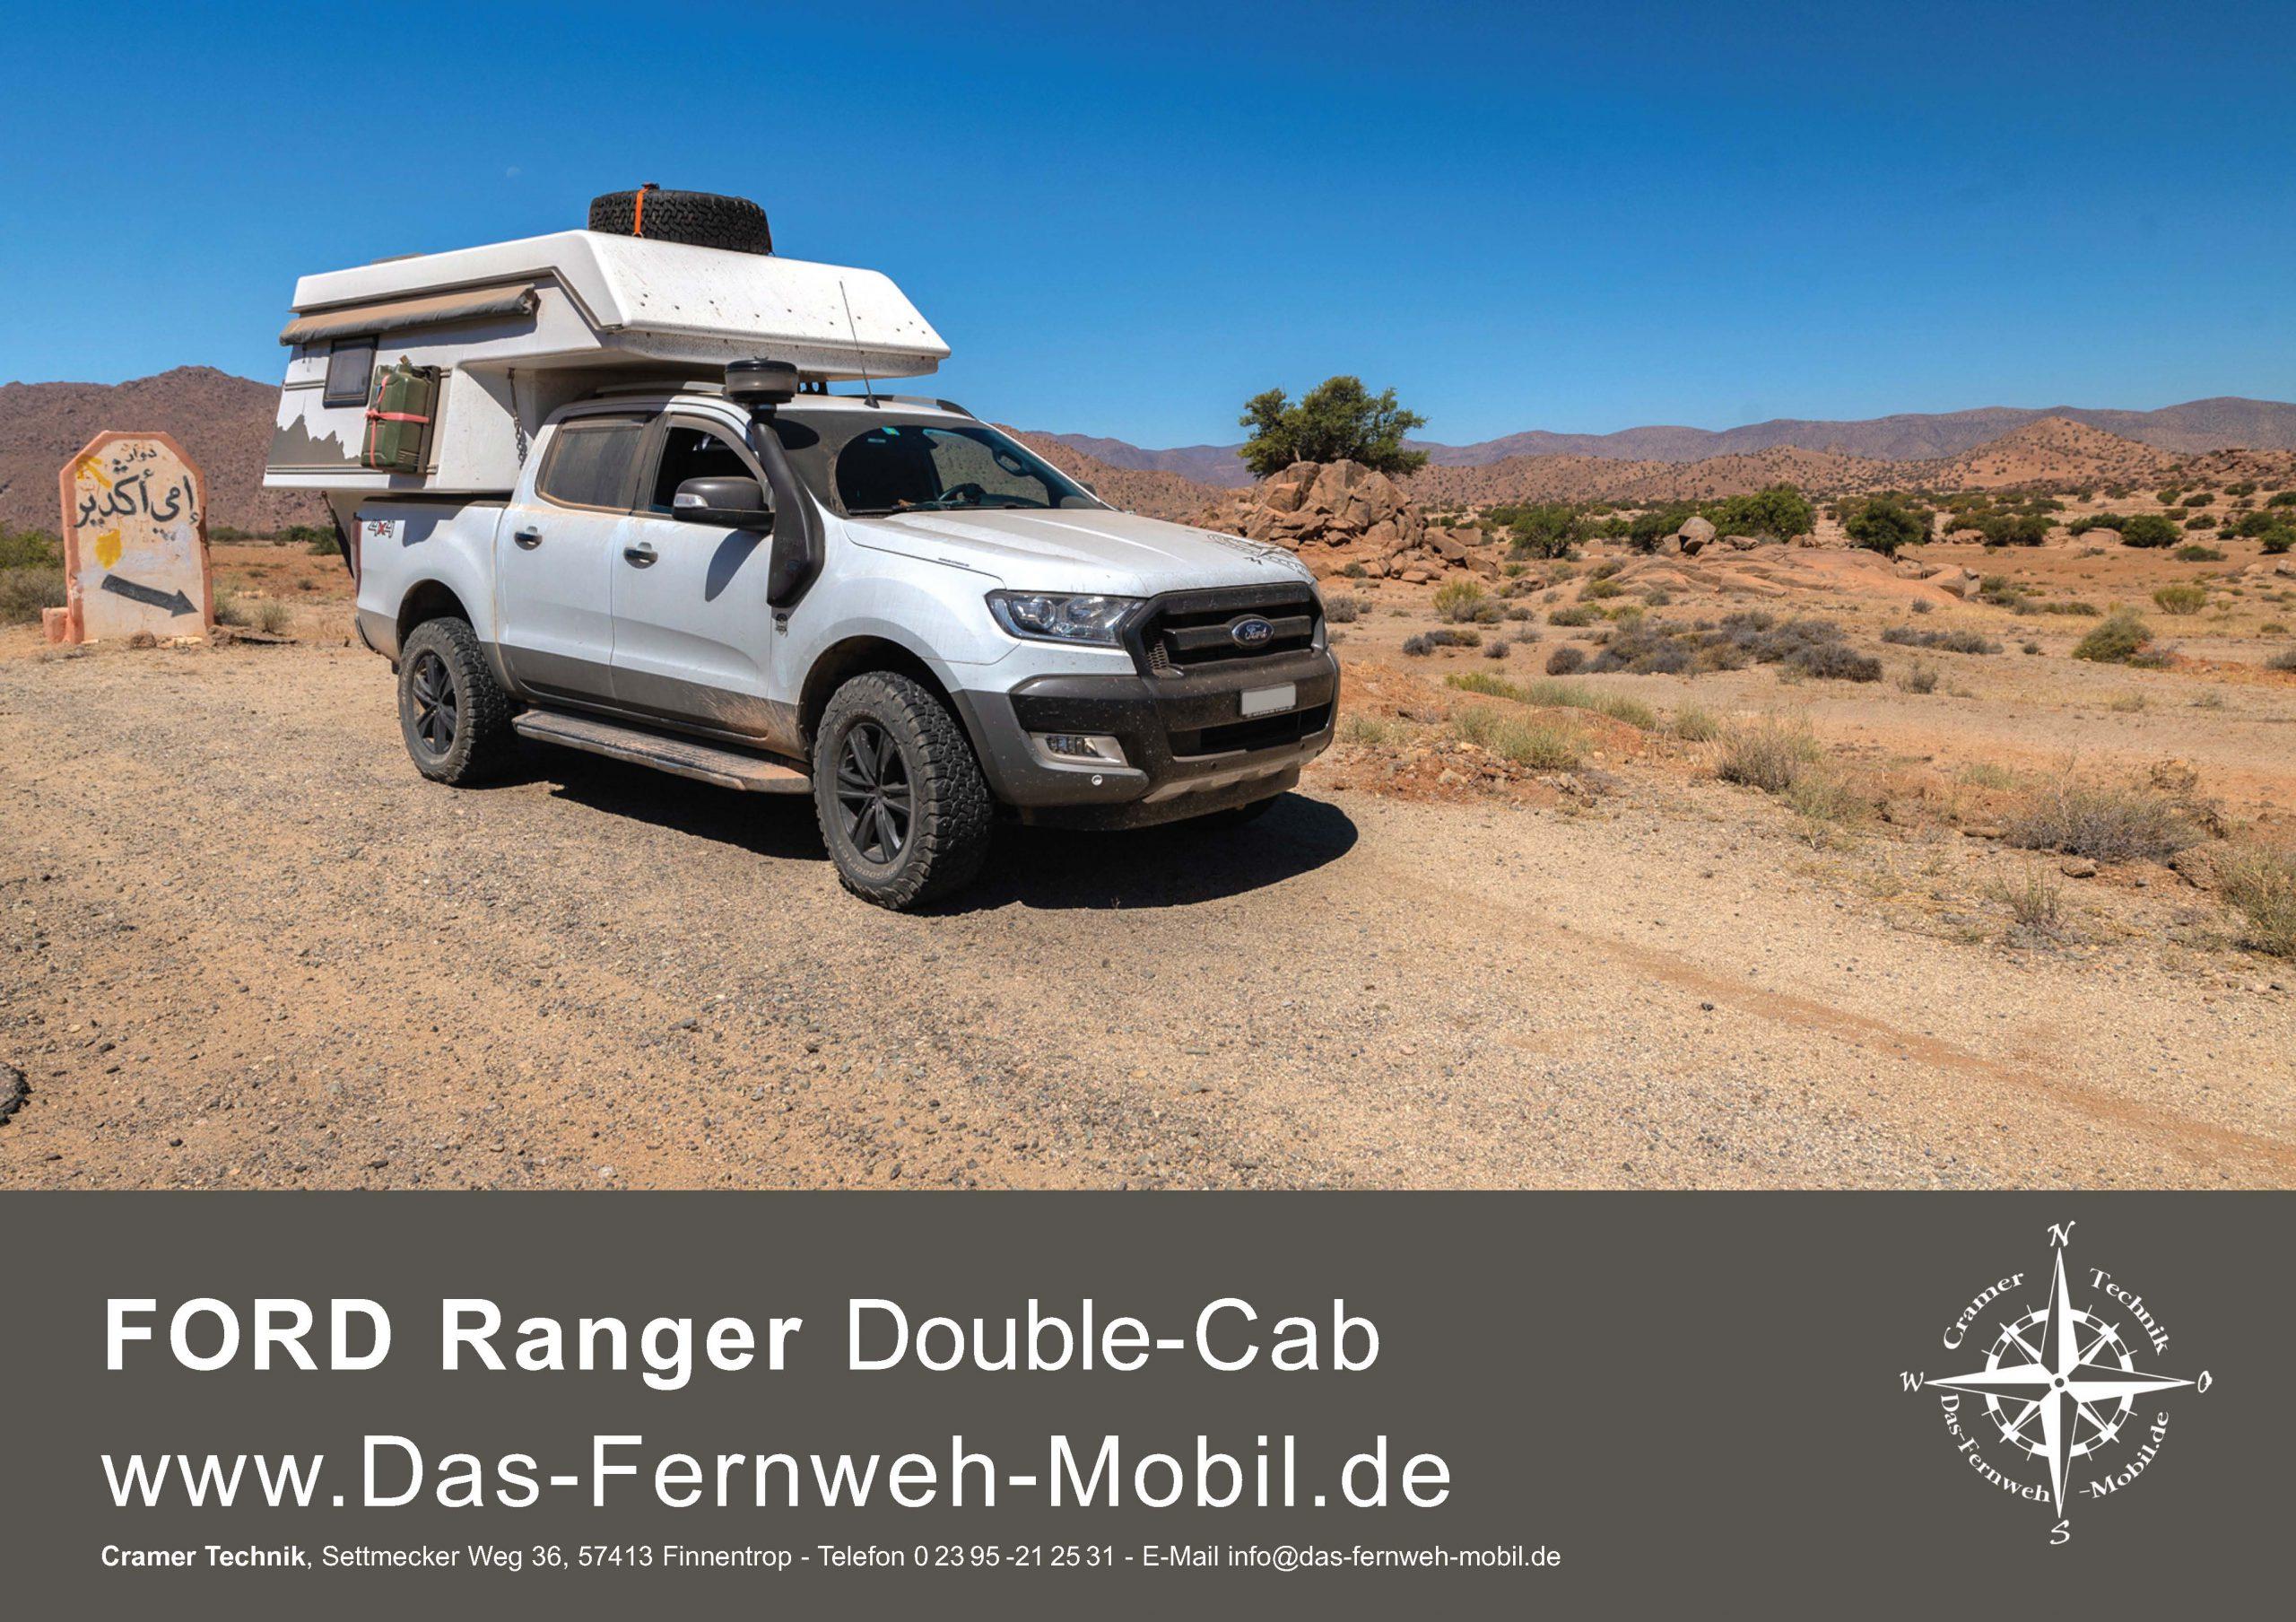 Datenblatt-Ford-Ranger-Double-Cab-102019_Seite_1